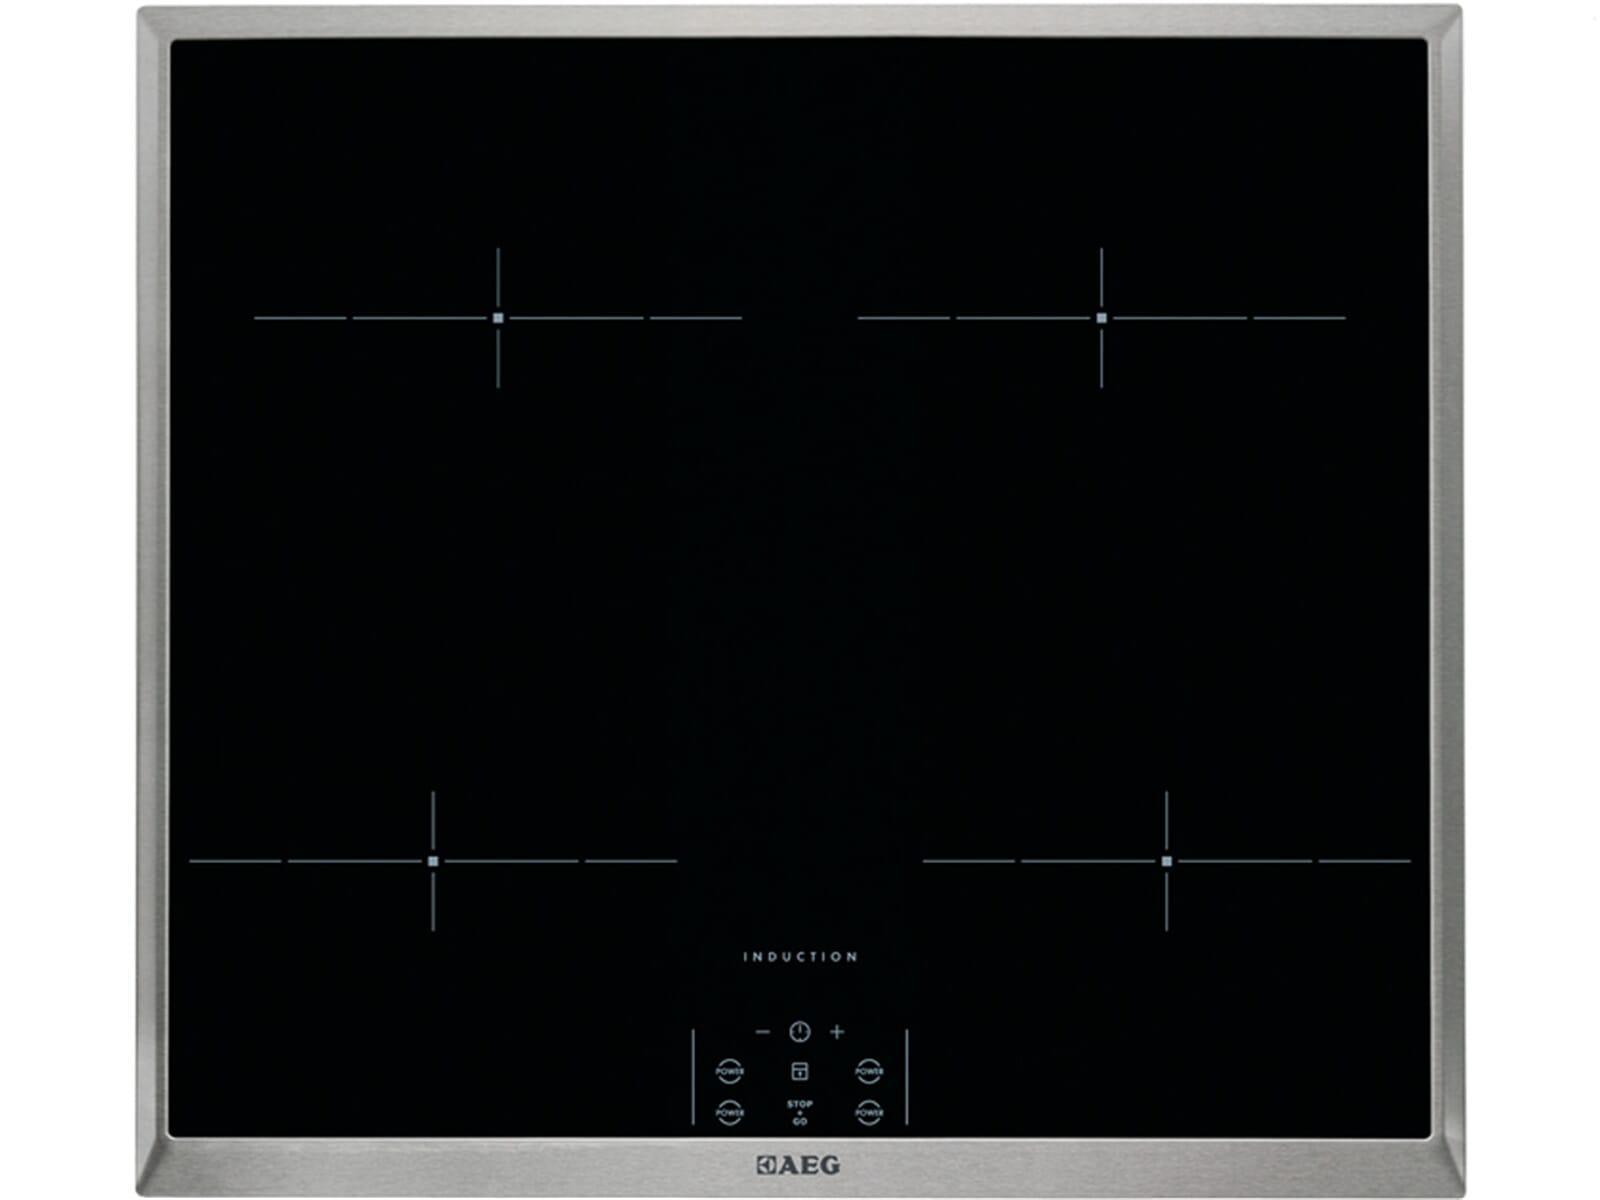 Produktabbildung AEG HEM63400X-B Induktion Glaskeramik Kochfeld herdgebunden